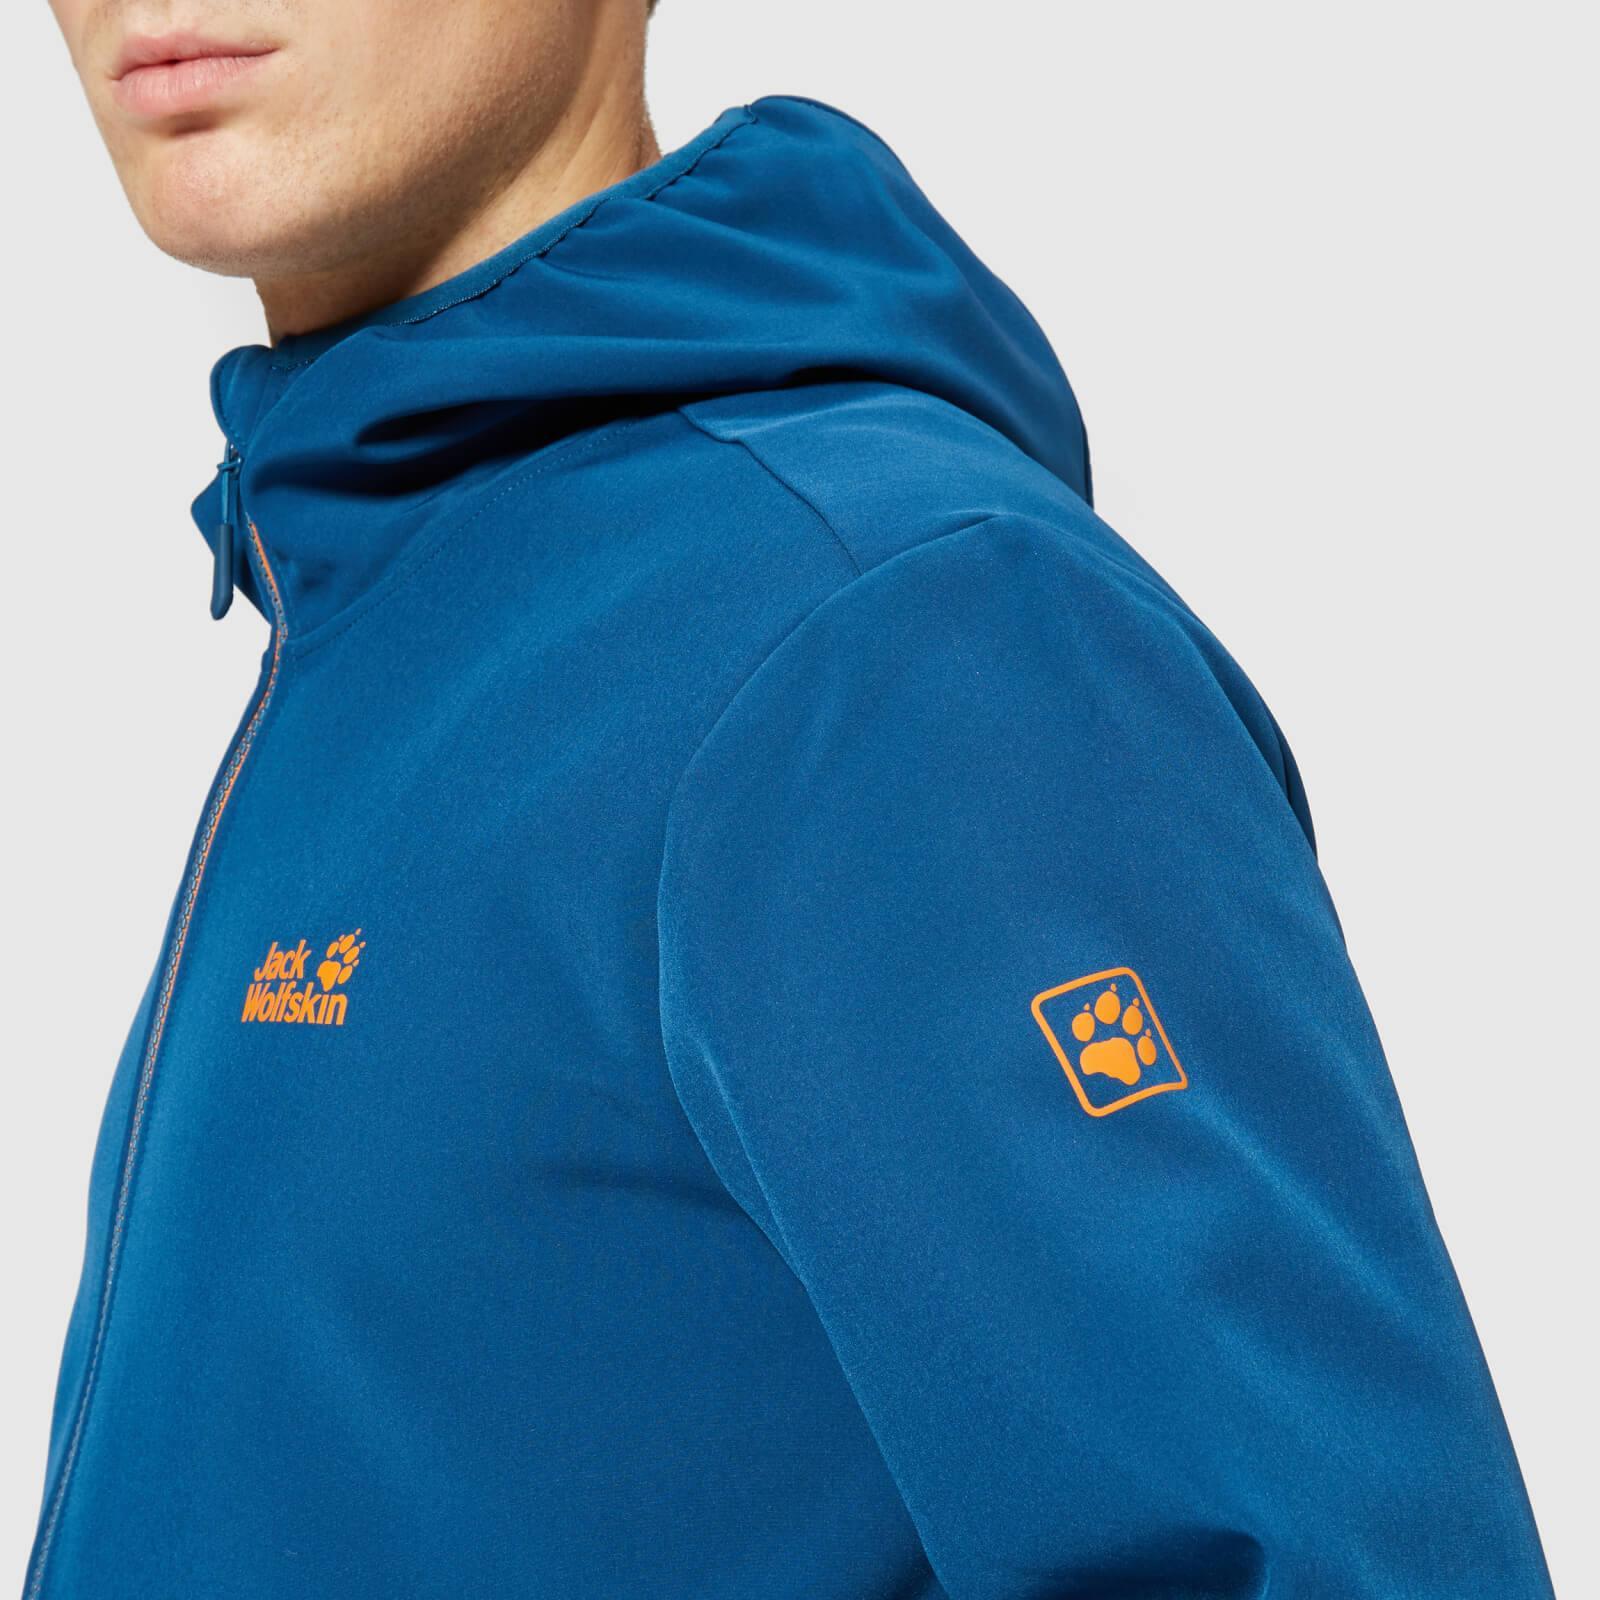 ce689281da ... Jack Wolfskin - Blue Essential Peak Jacket for Men - Lyst. Visit The  Hut. Tap to visit site